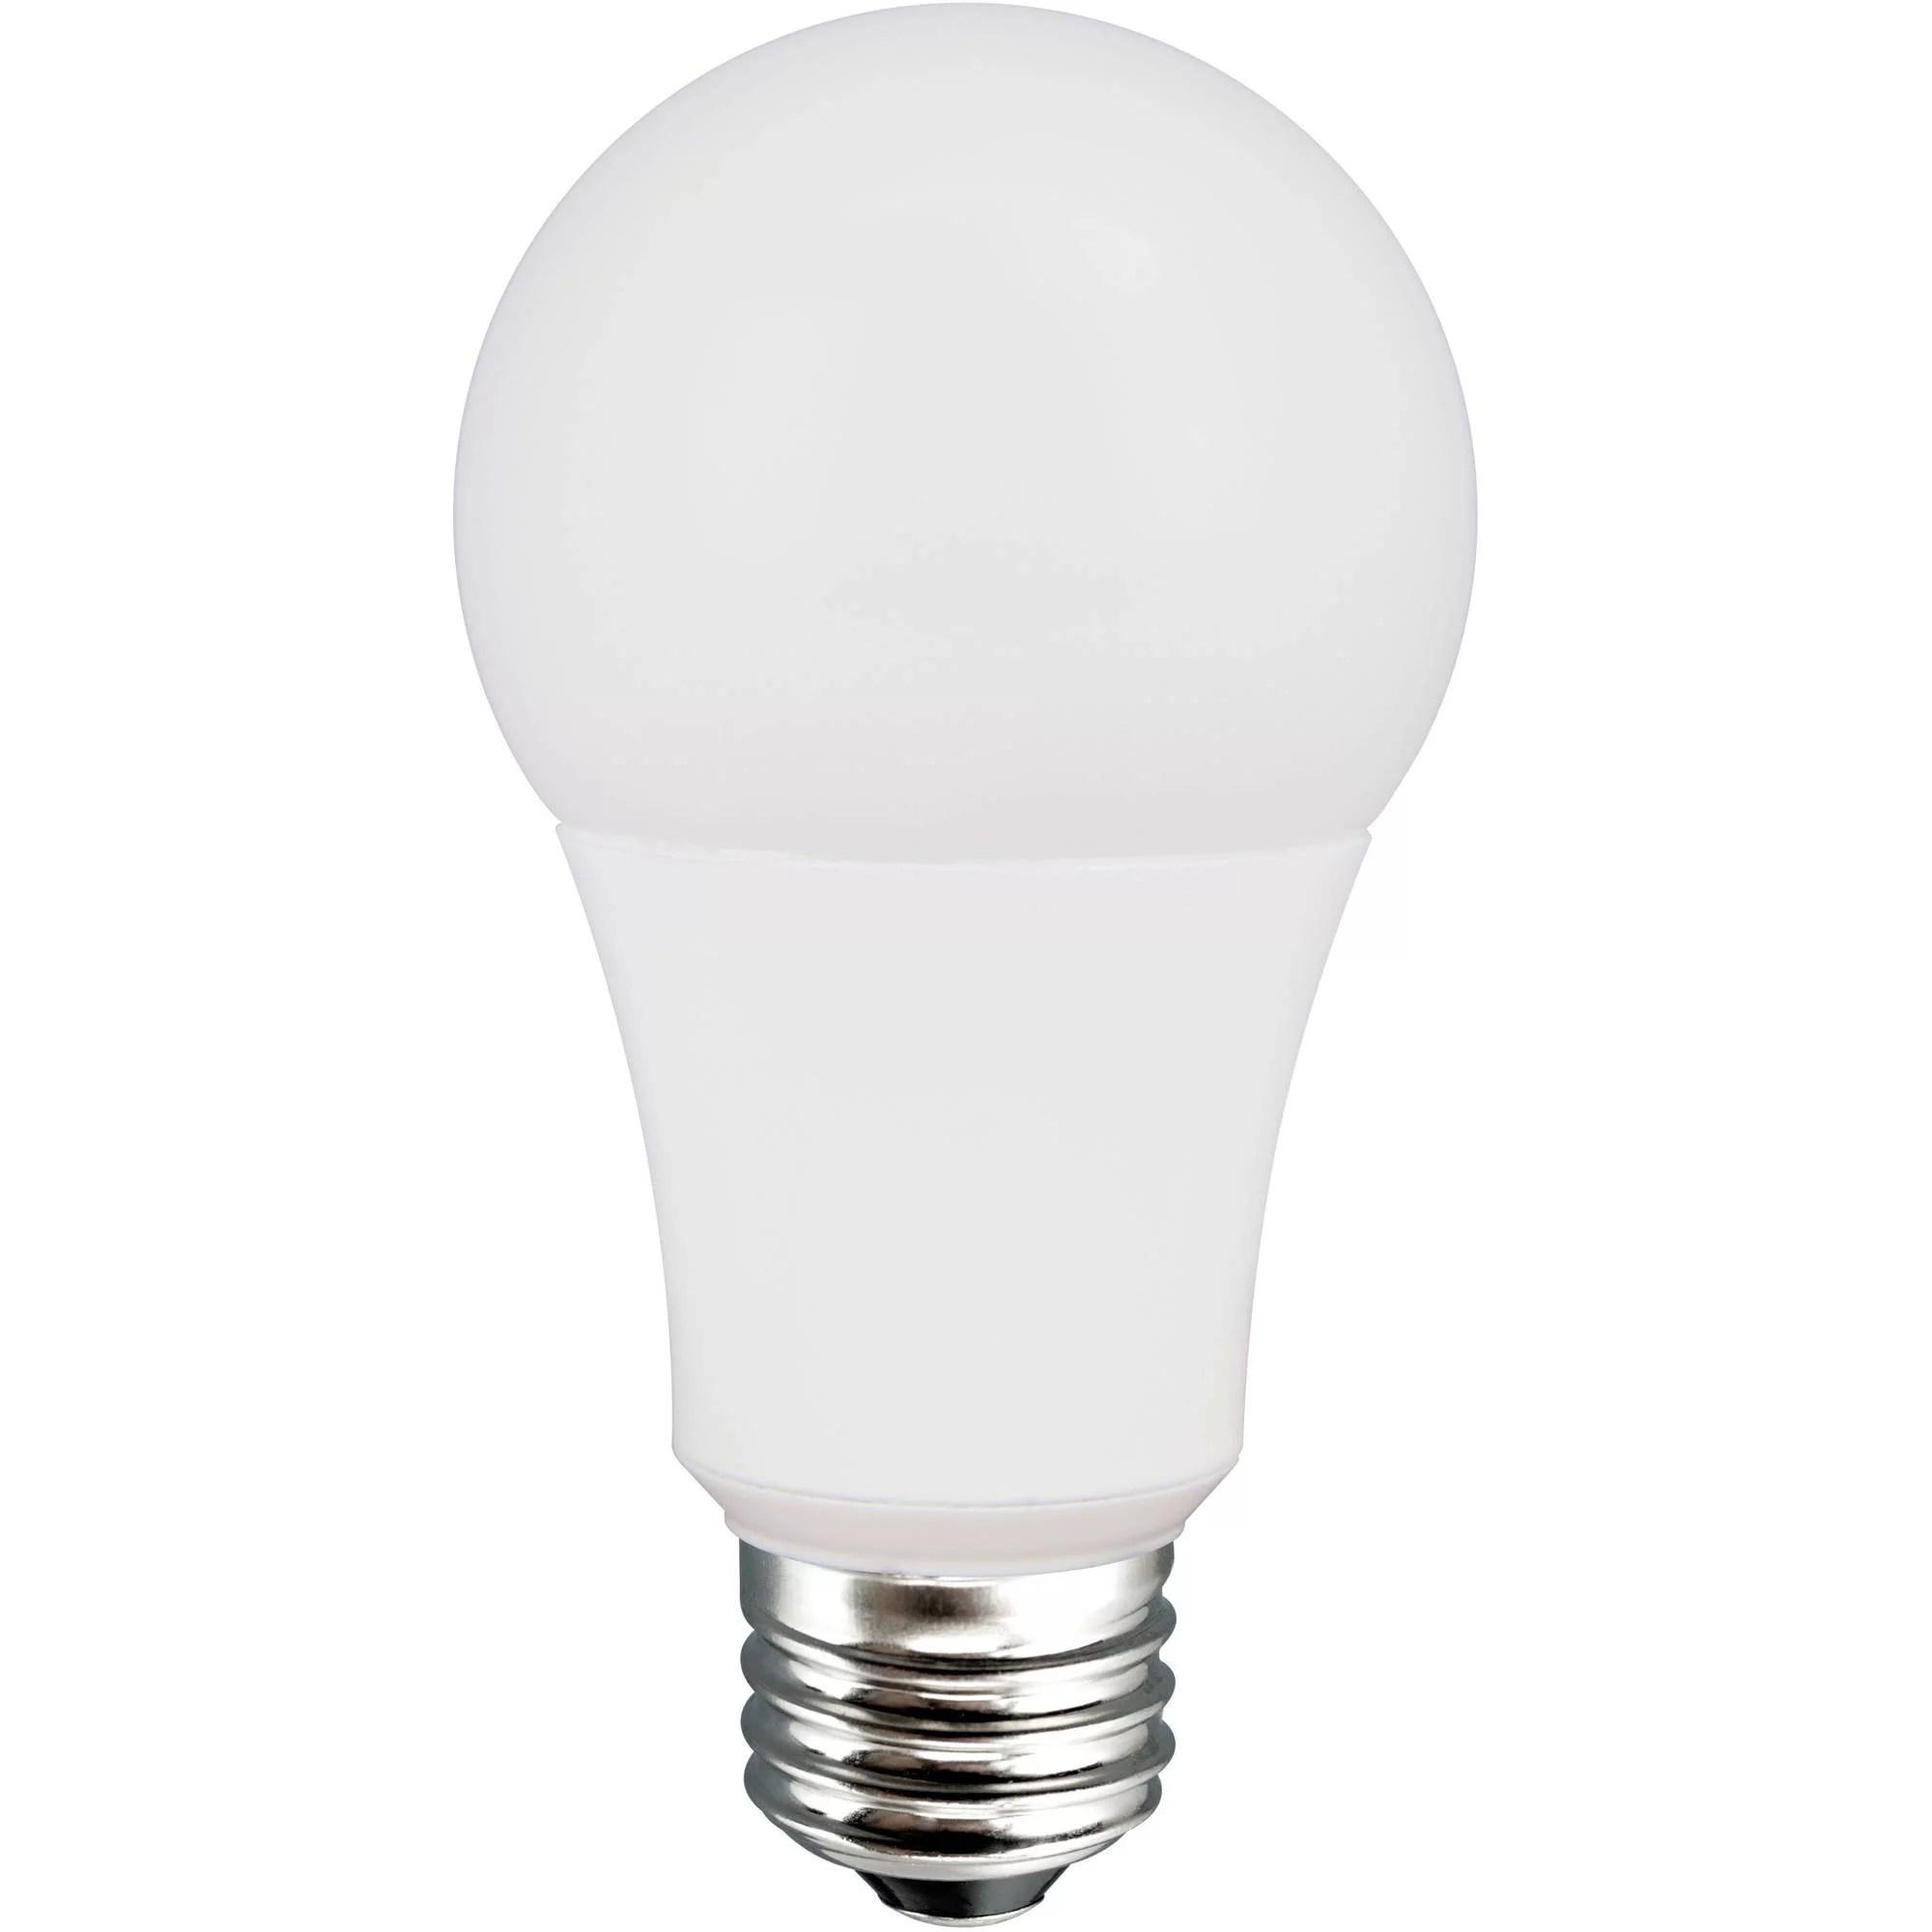 great value led light